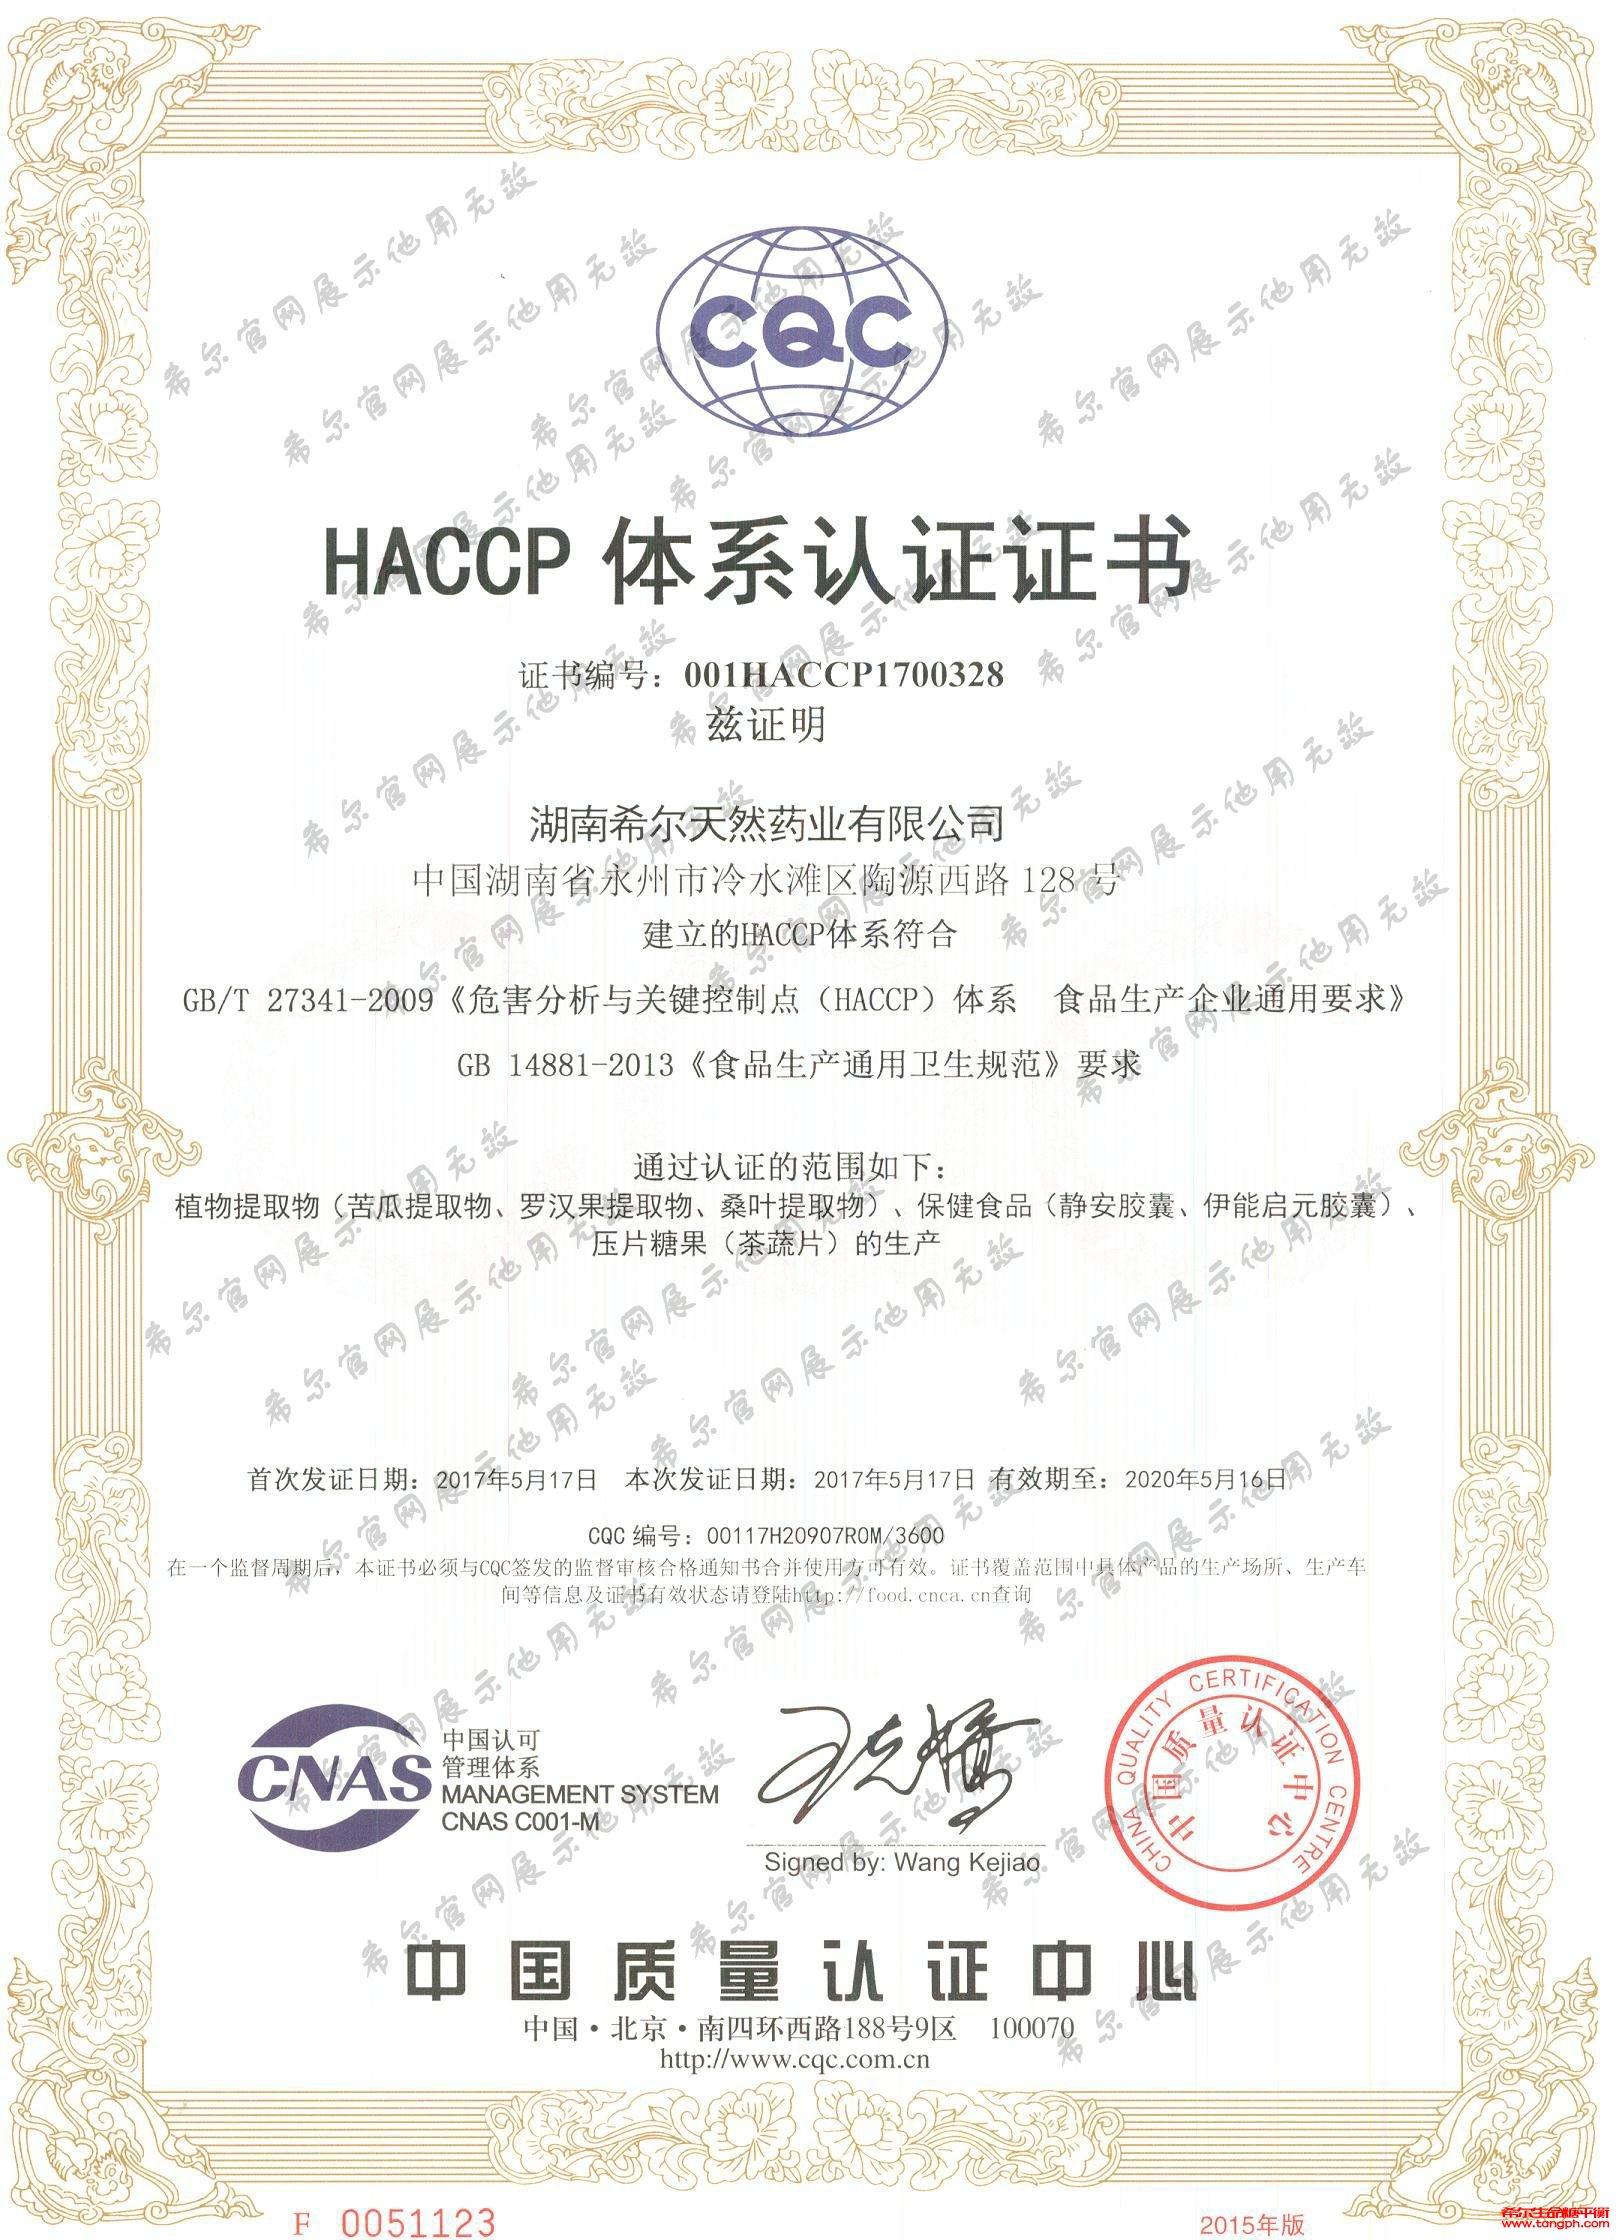 45HACCP中文